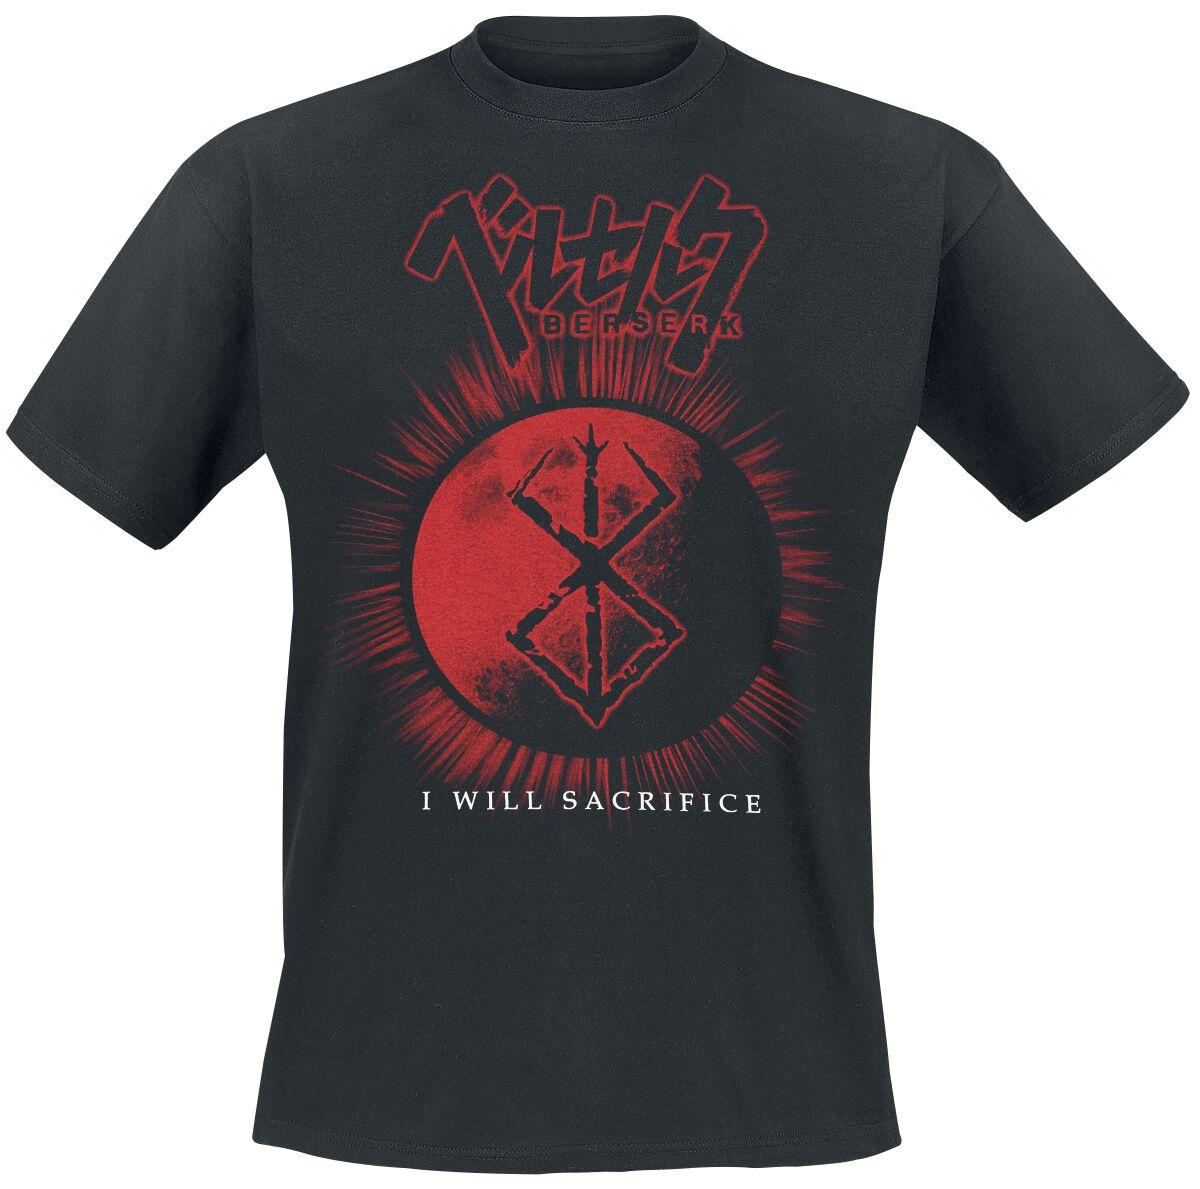 Merch dla Fanów - Koszulki - T-Shirt Beserk Logo T-Shirt czarny - 364655